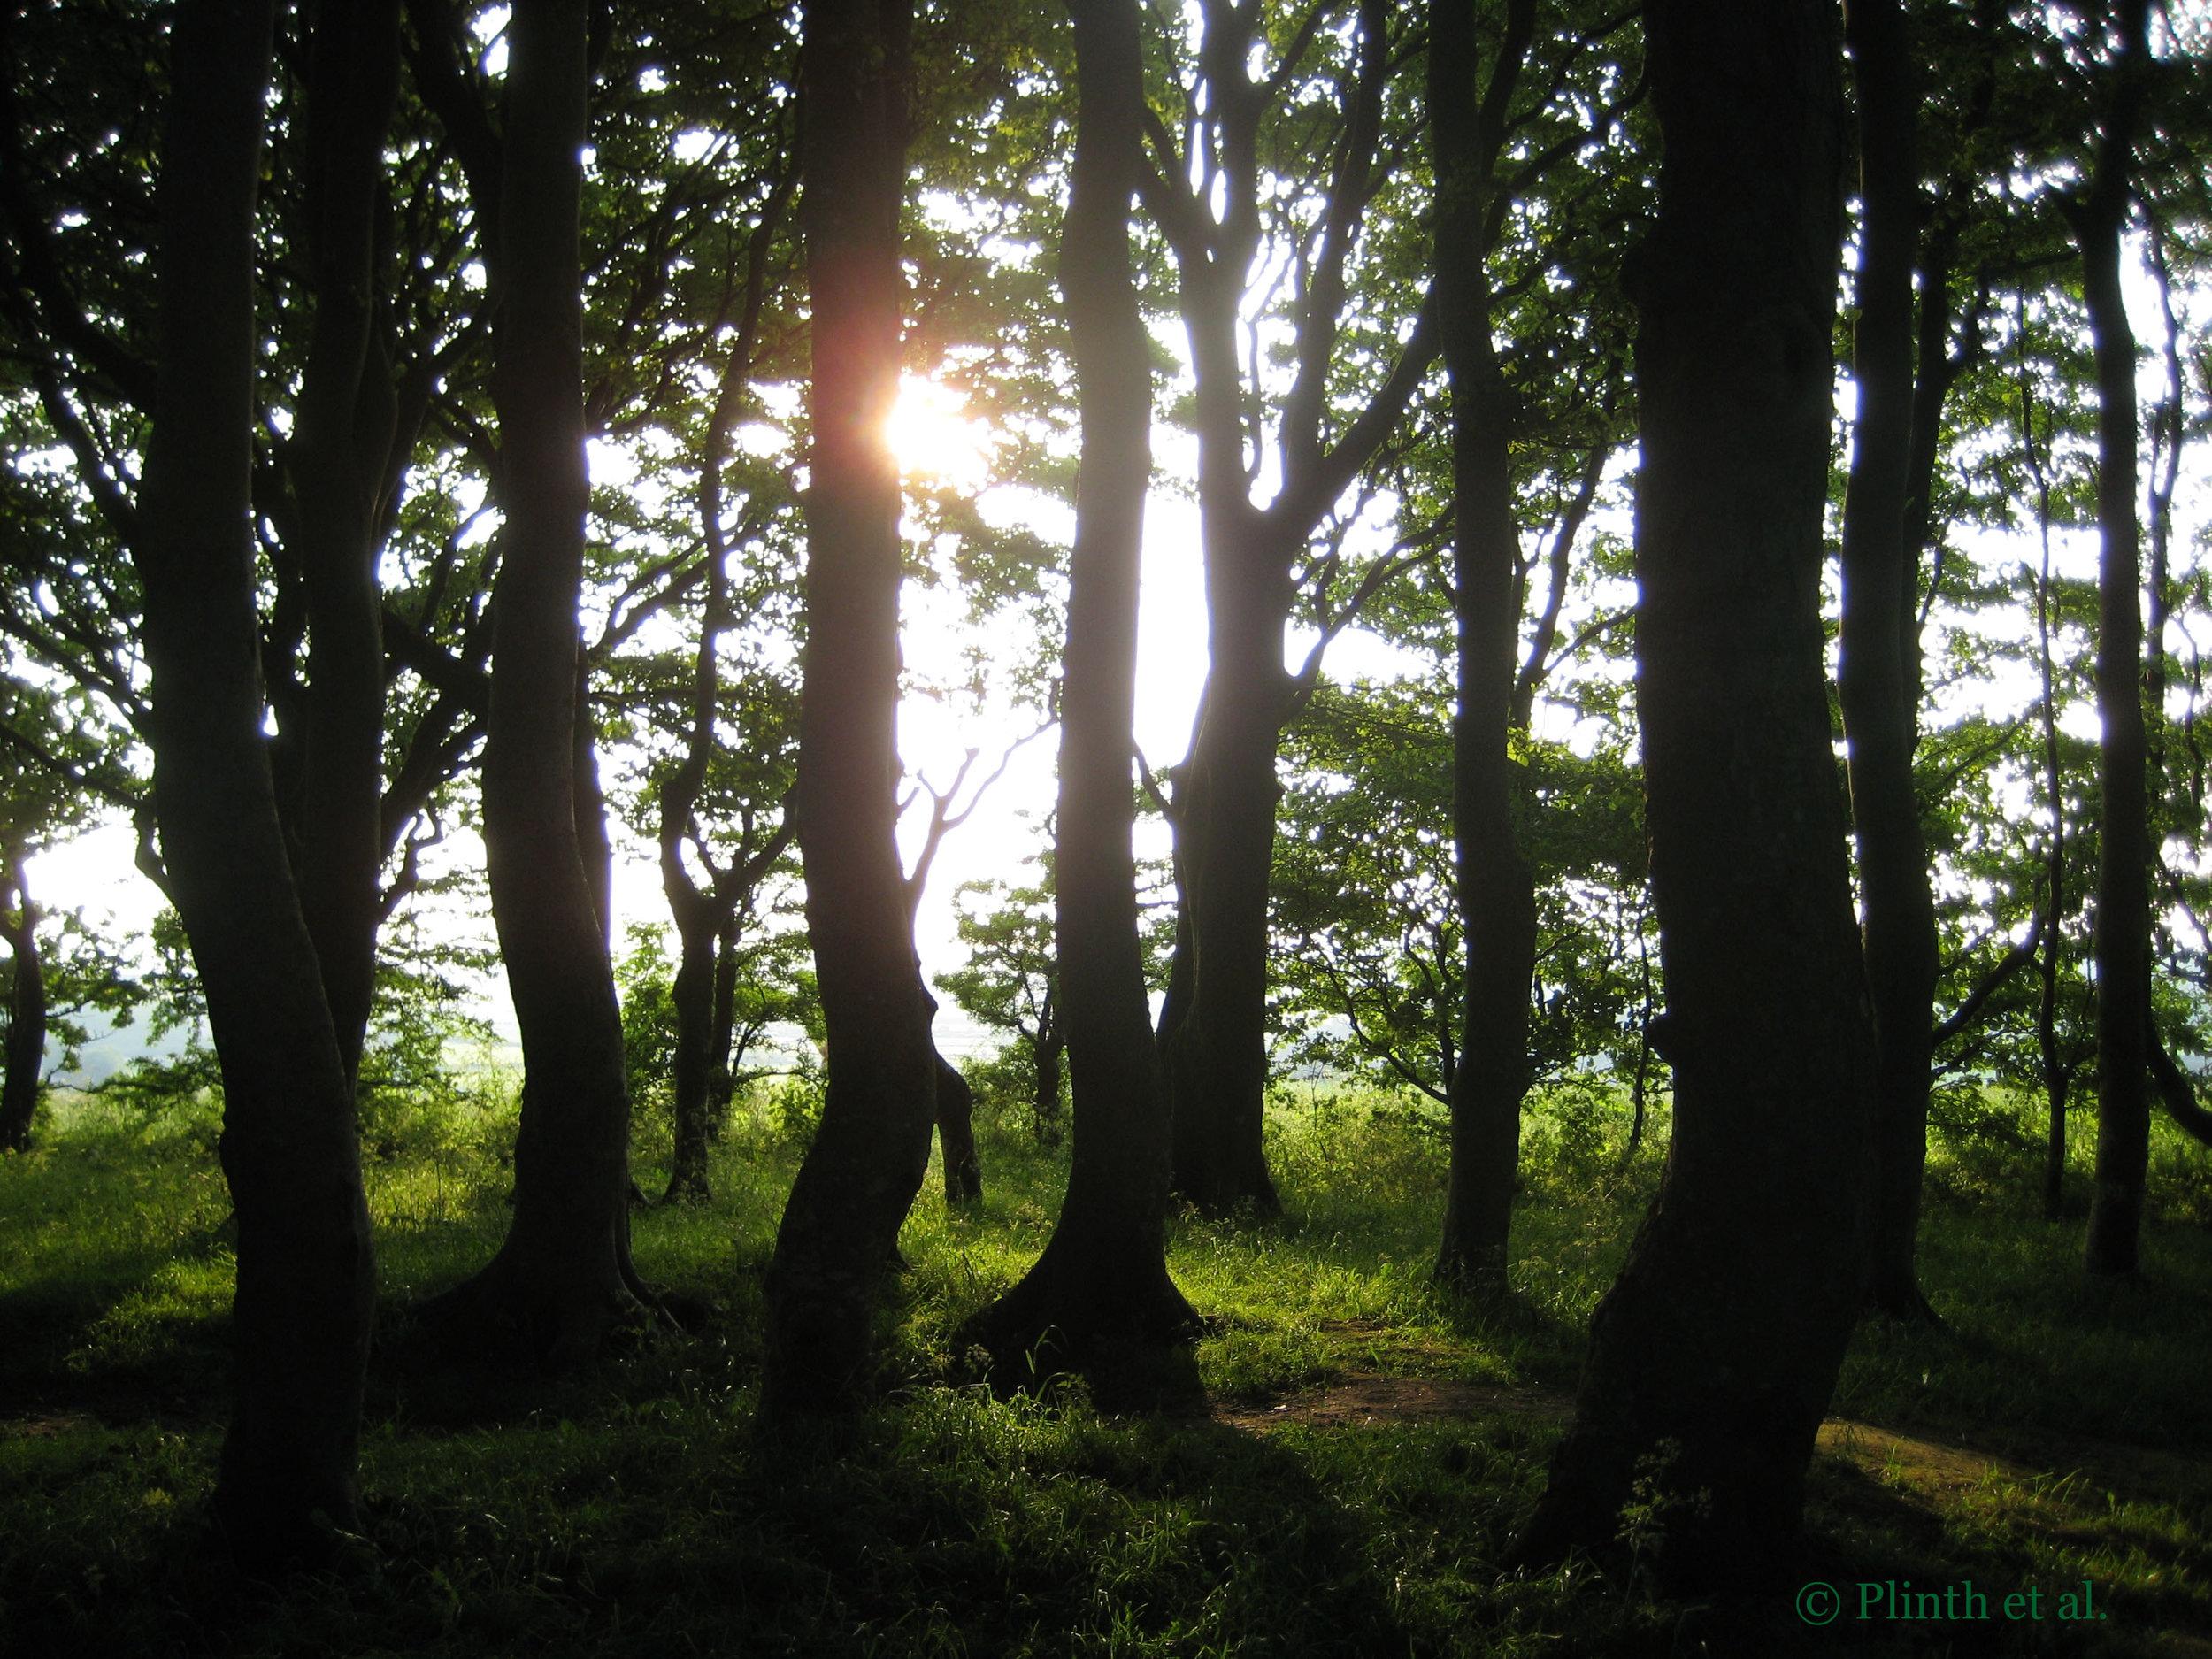 groveoftrees.jpg